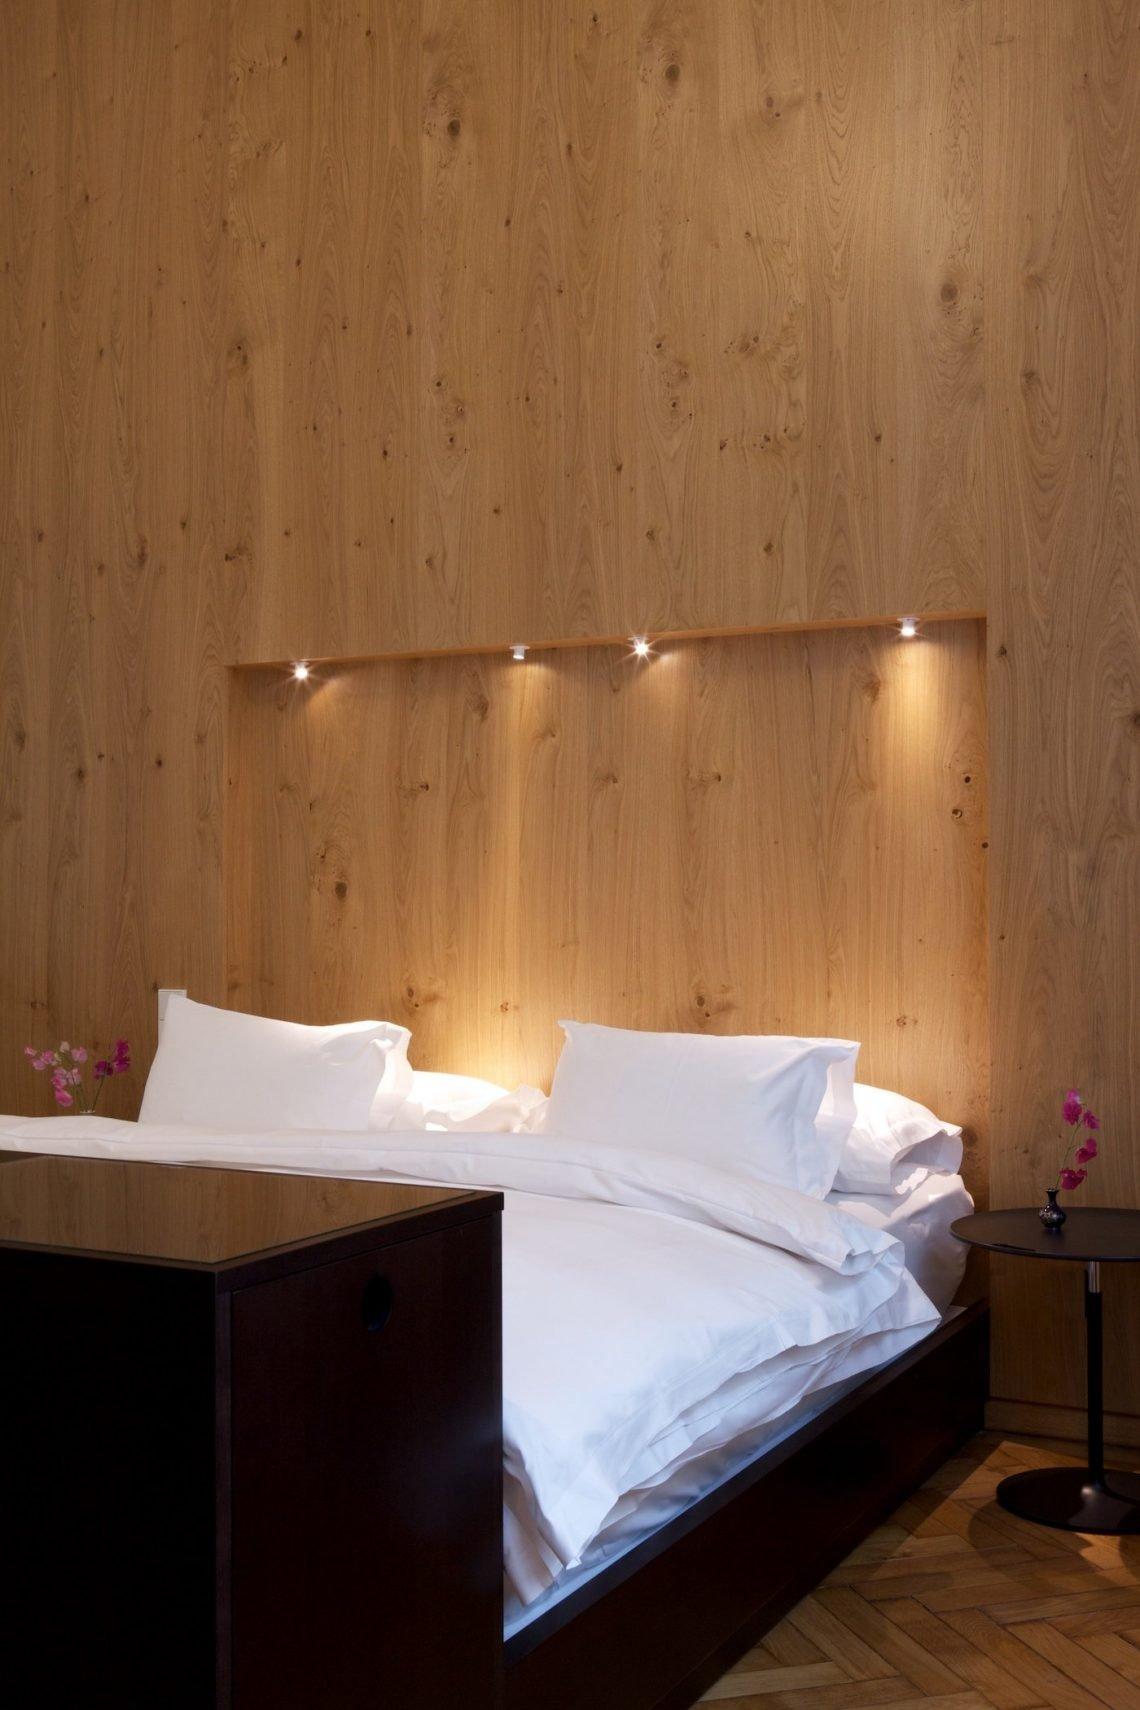 Bett Kissen Interieur Bettwäsche weiß buche holz lampen schwarz parkett